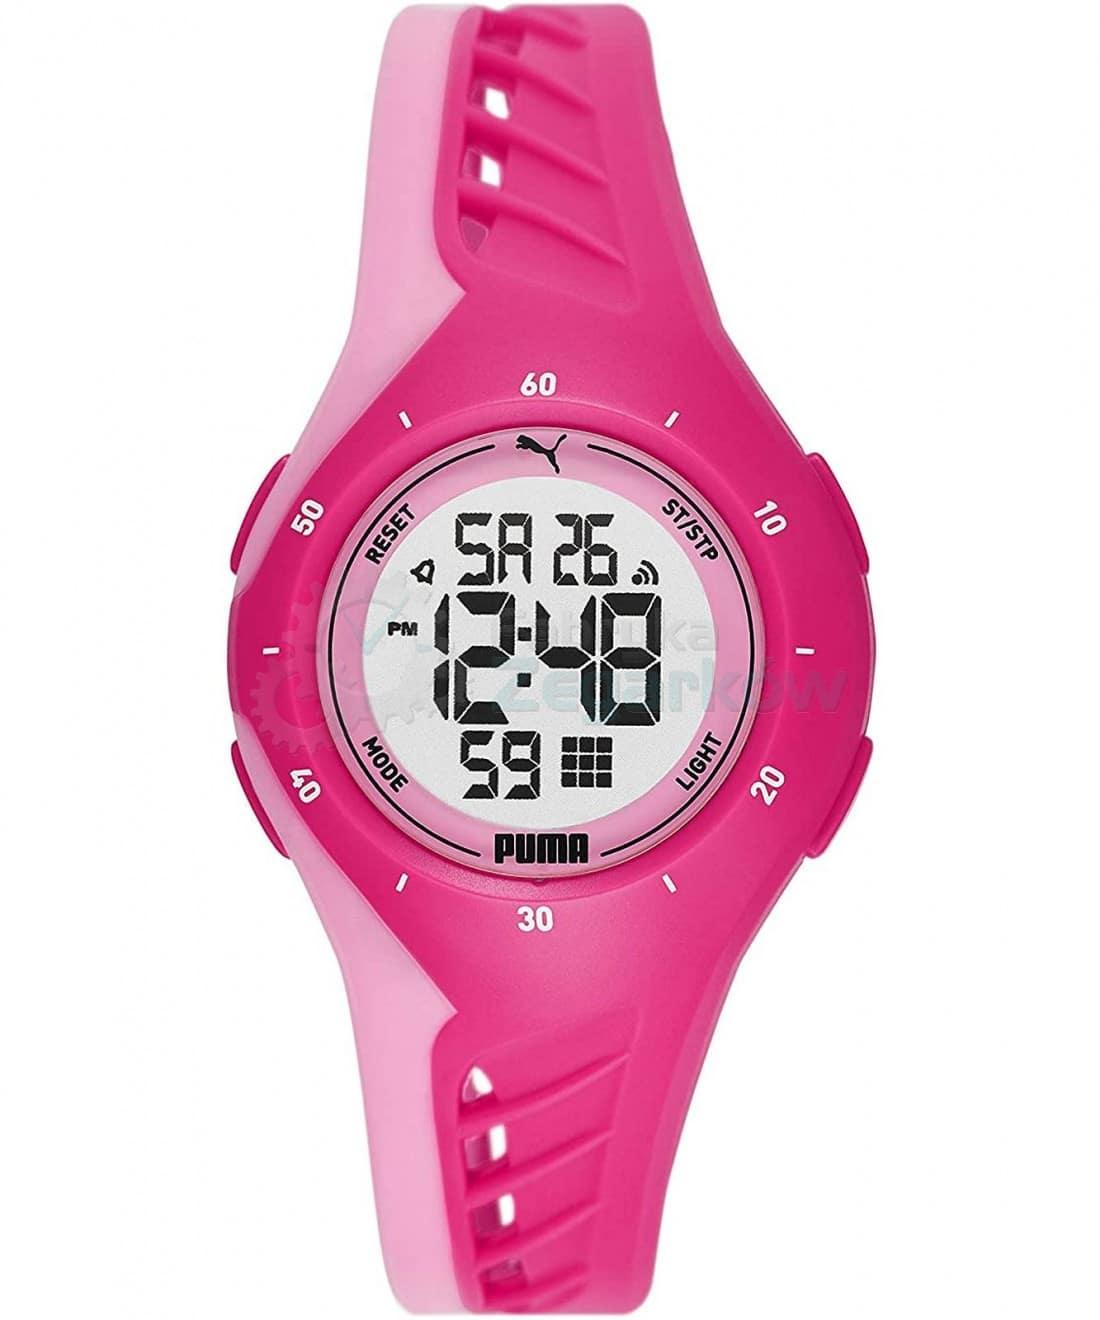 zegarek-damski-puma-lcd-p6008